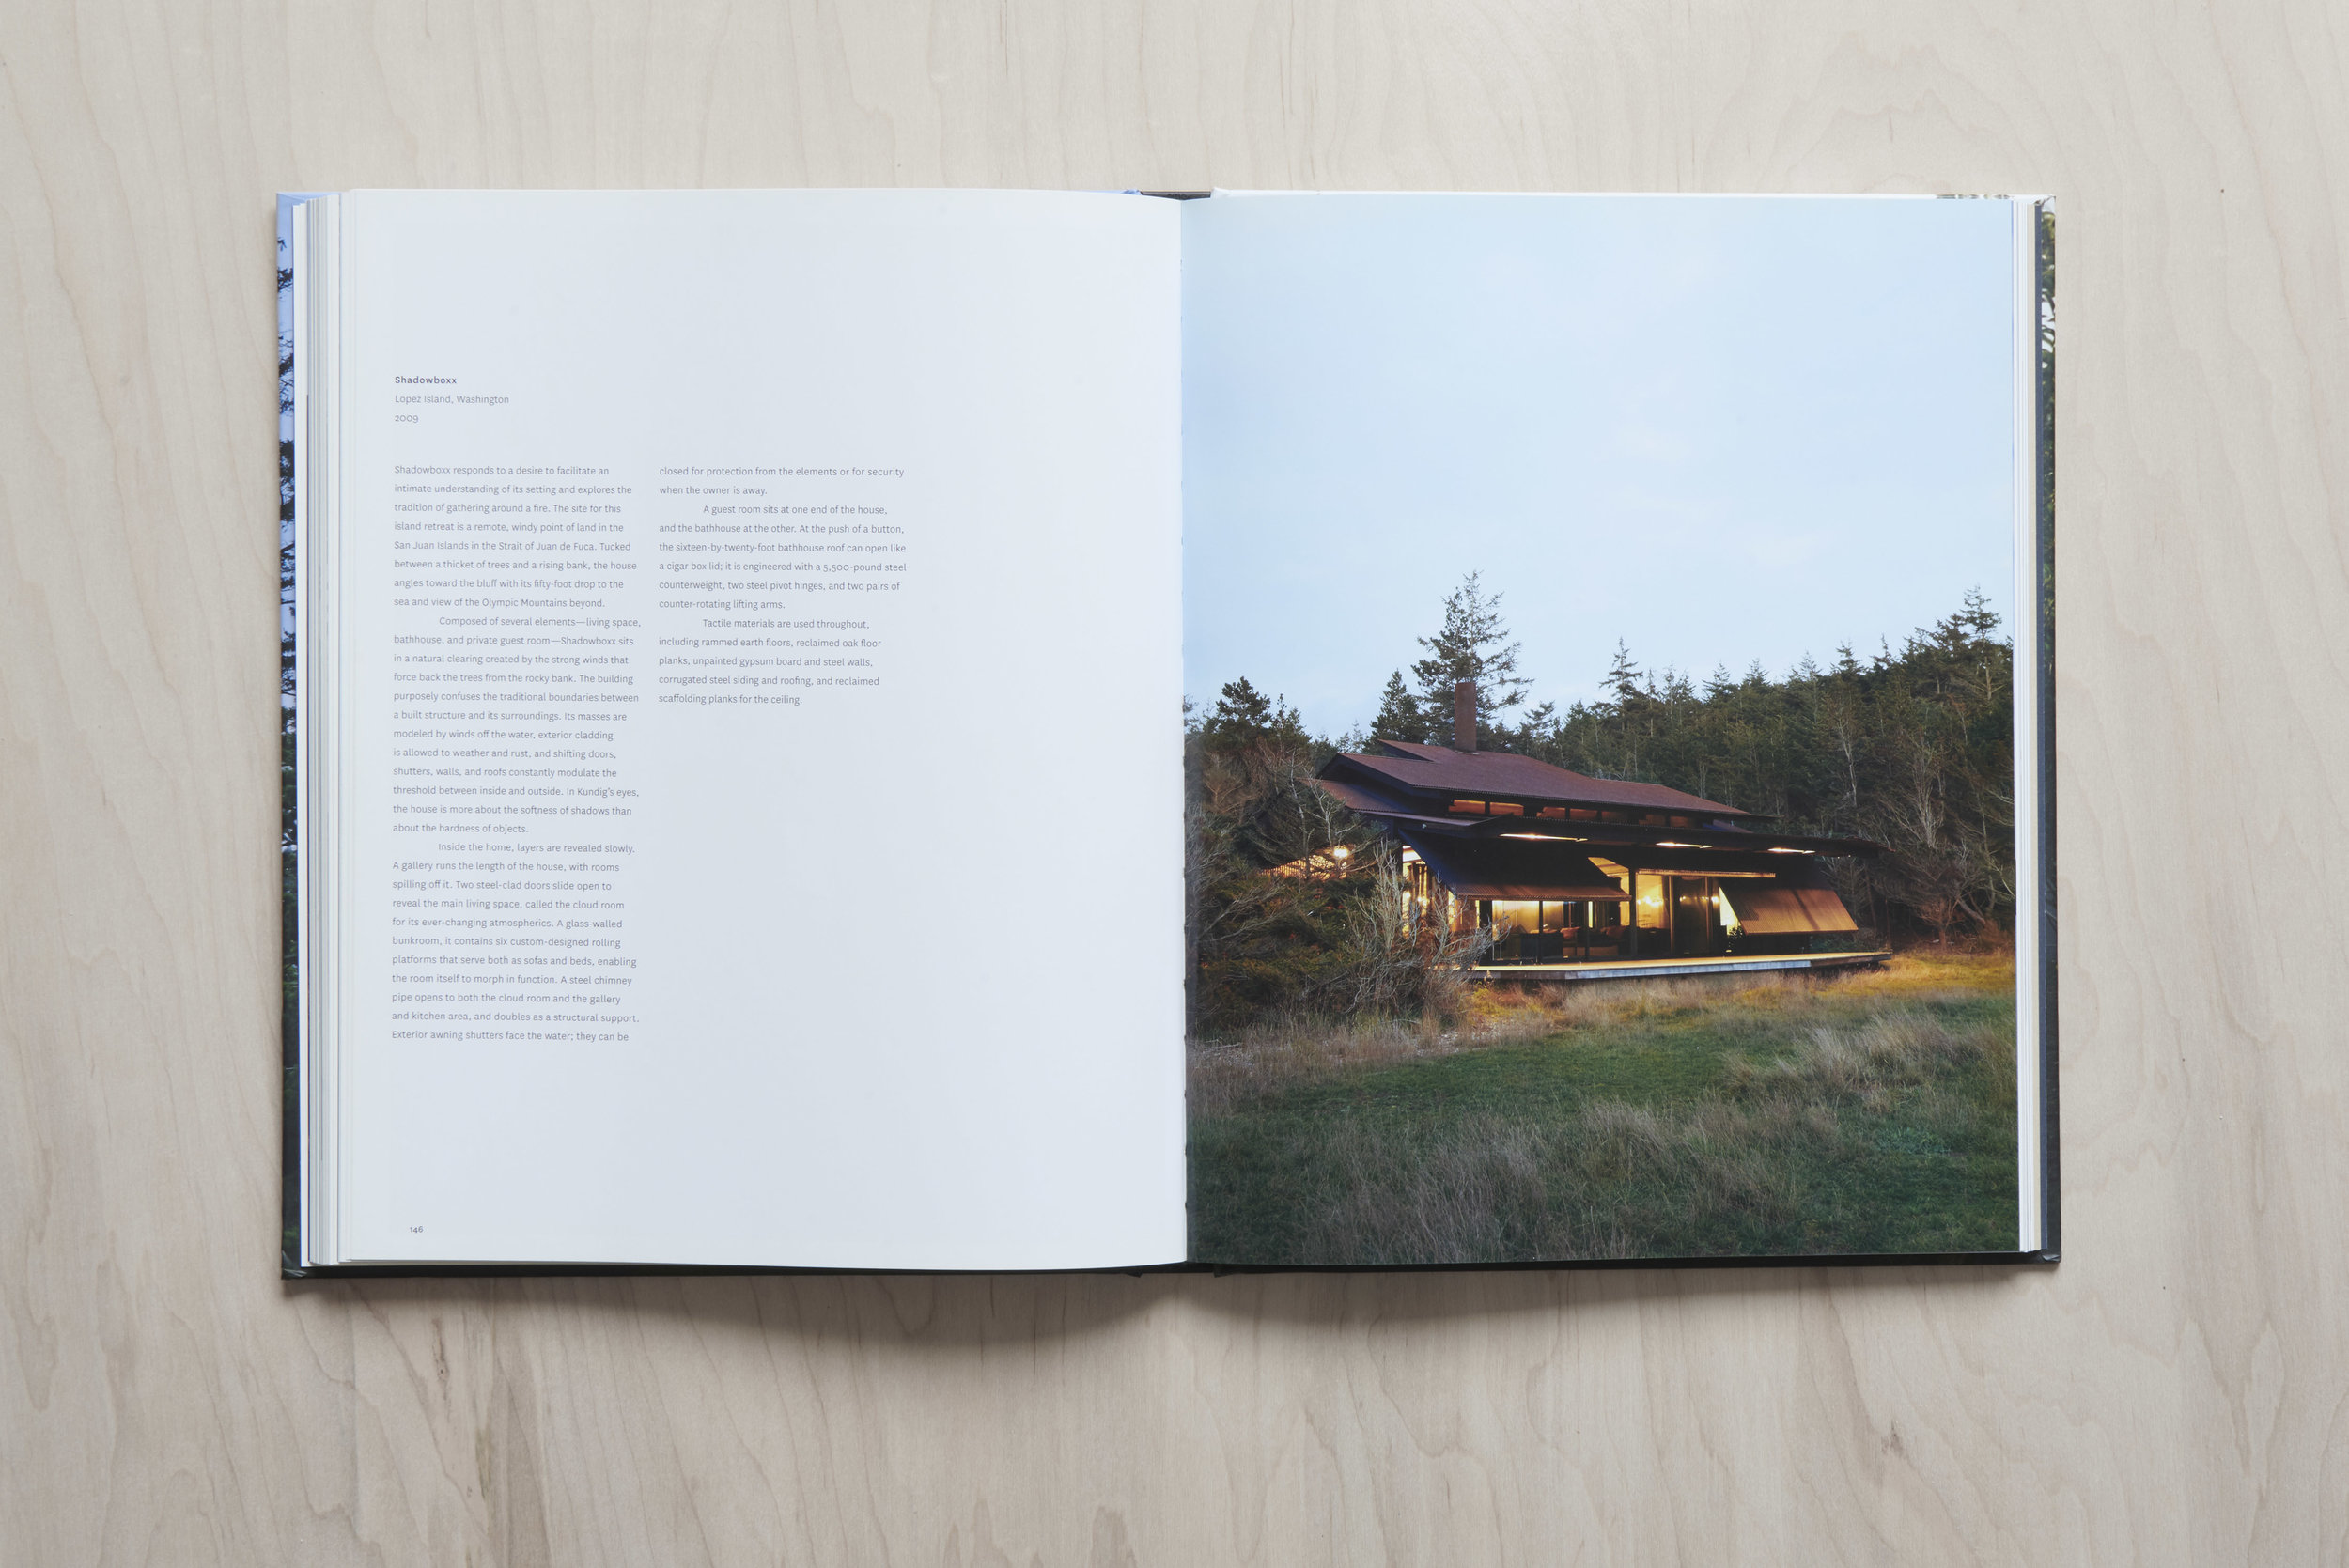 2019_03_04_bookproject_0430.jpg